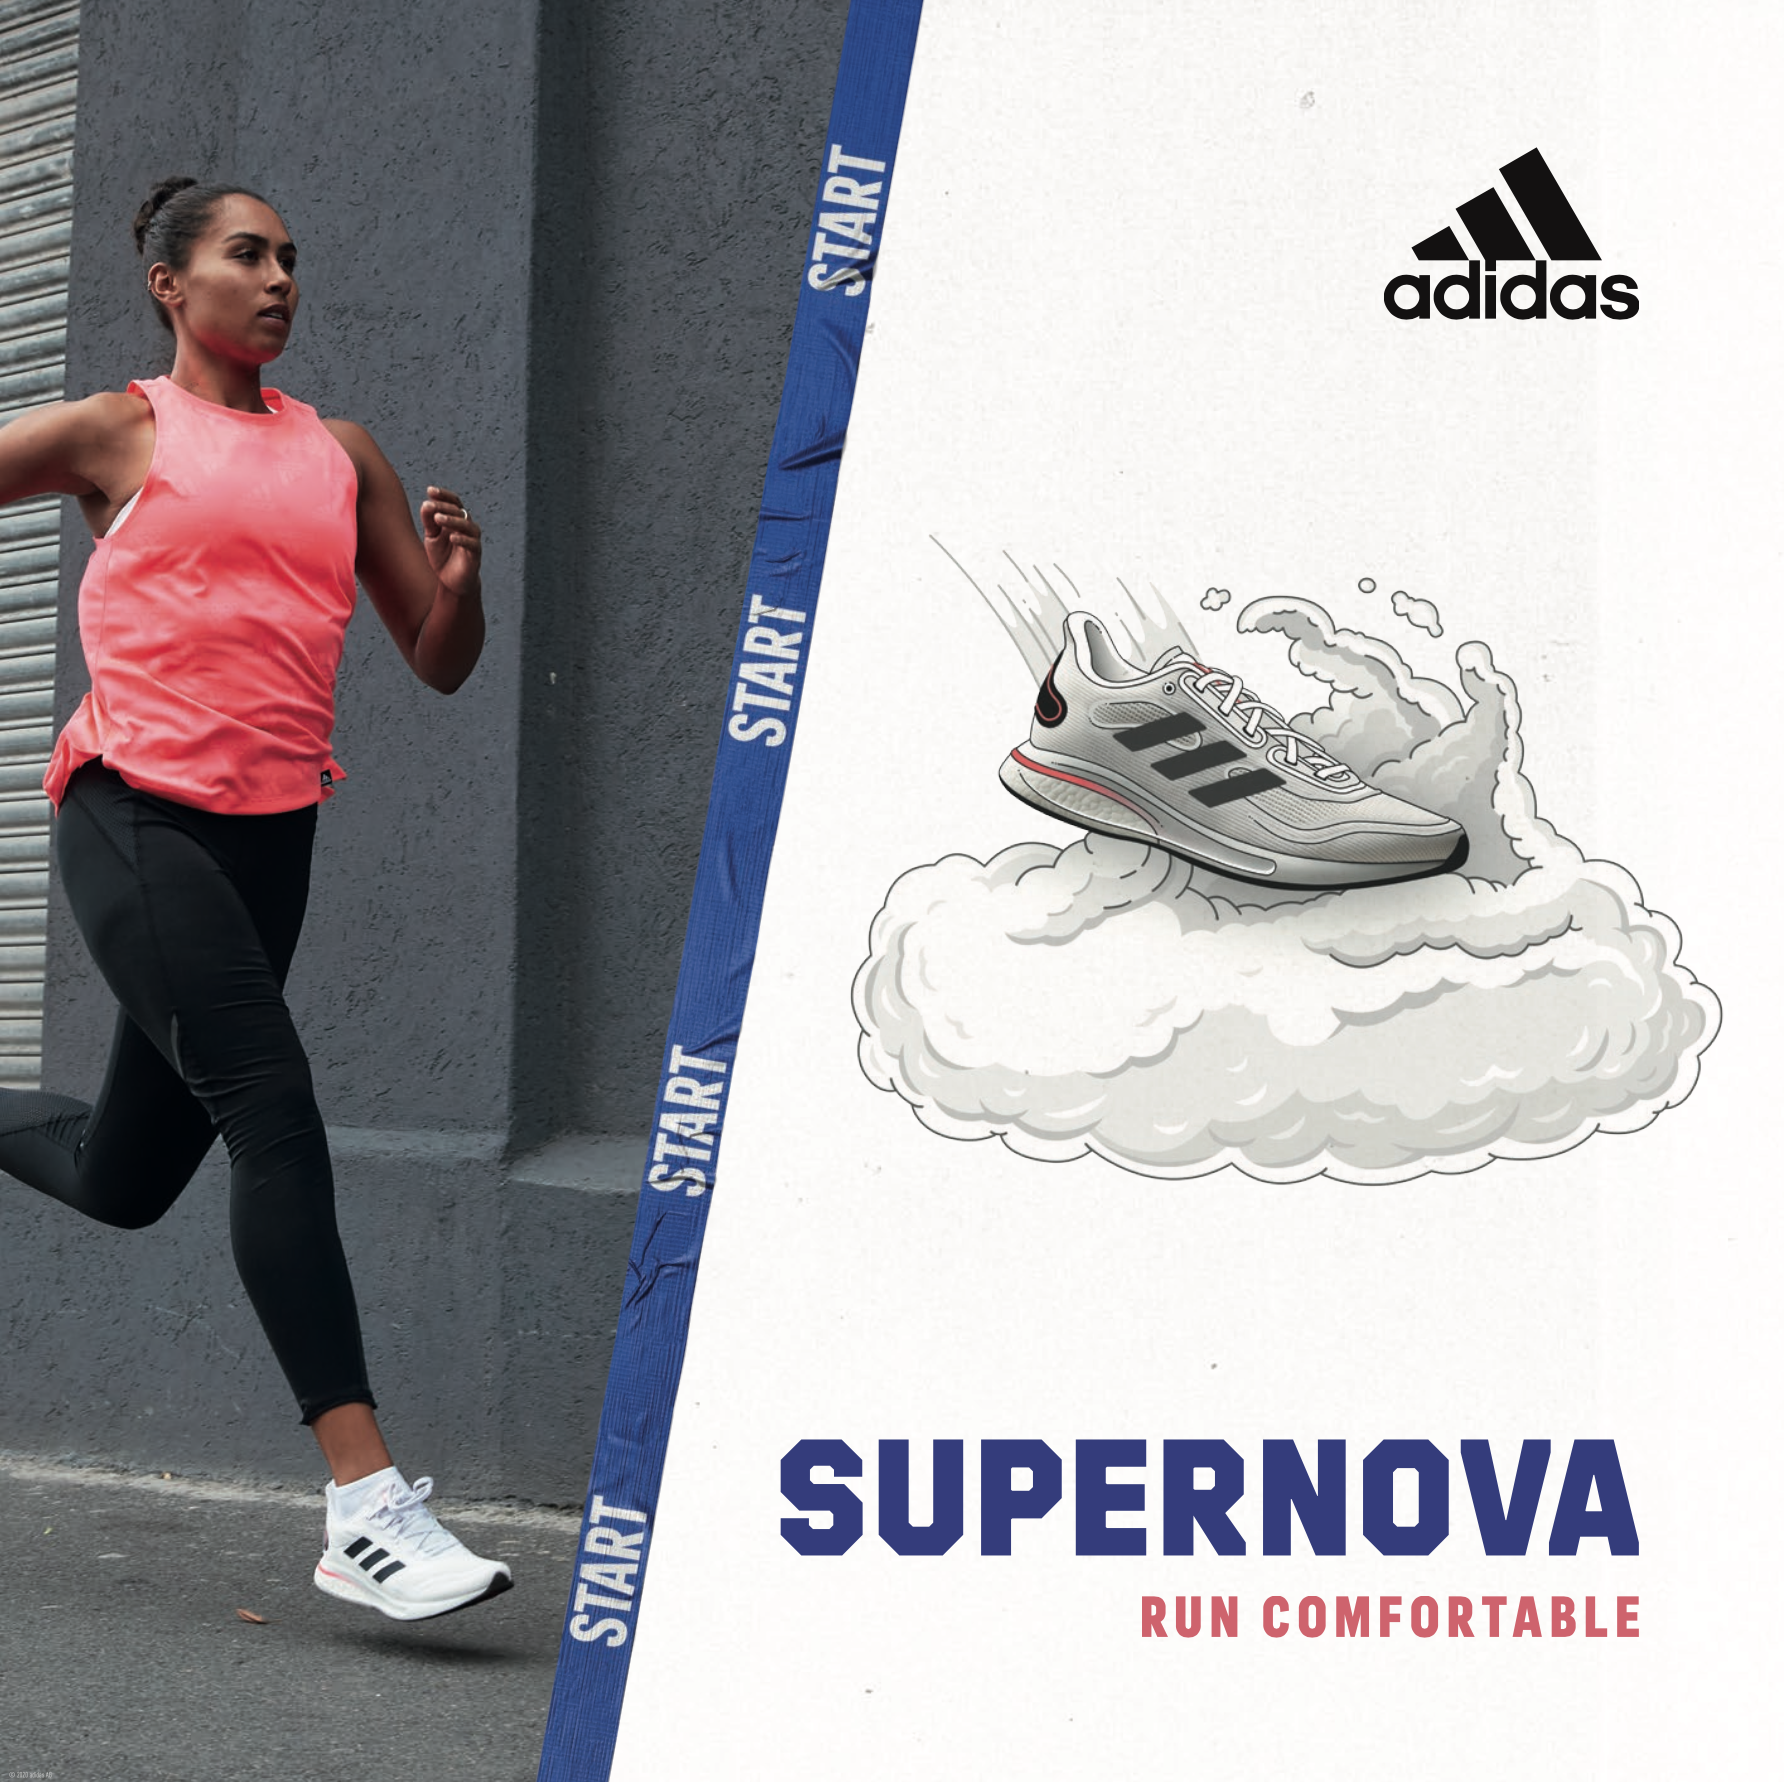 supernova_run-comfortable_KV